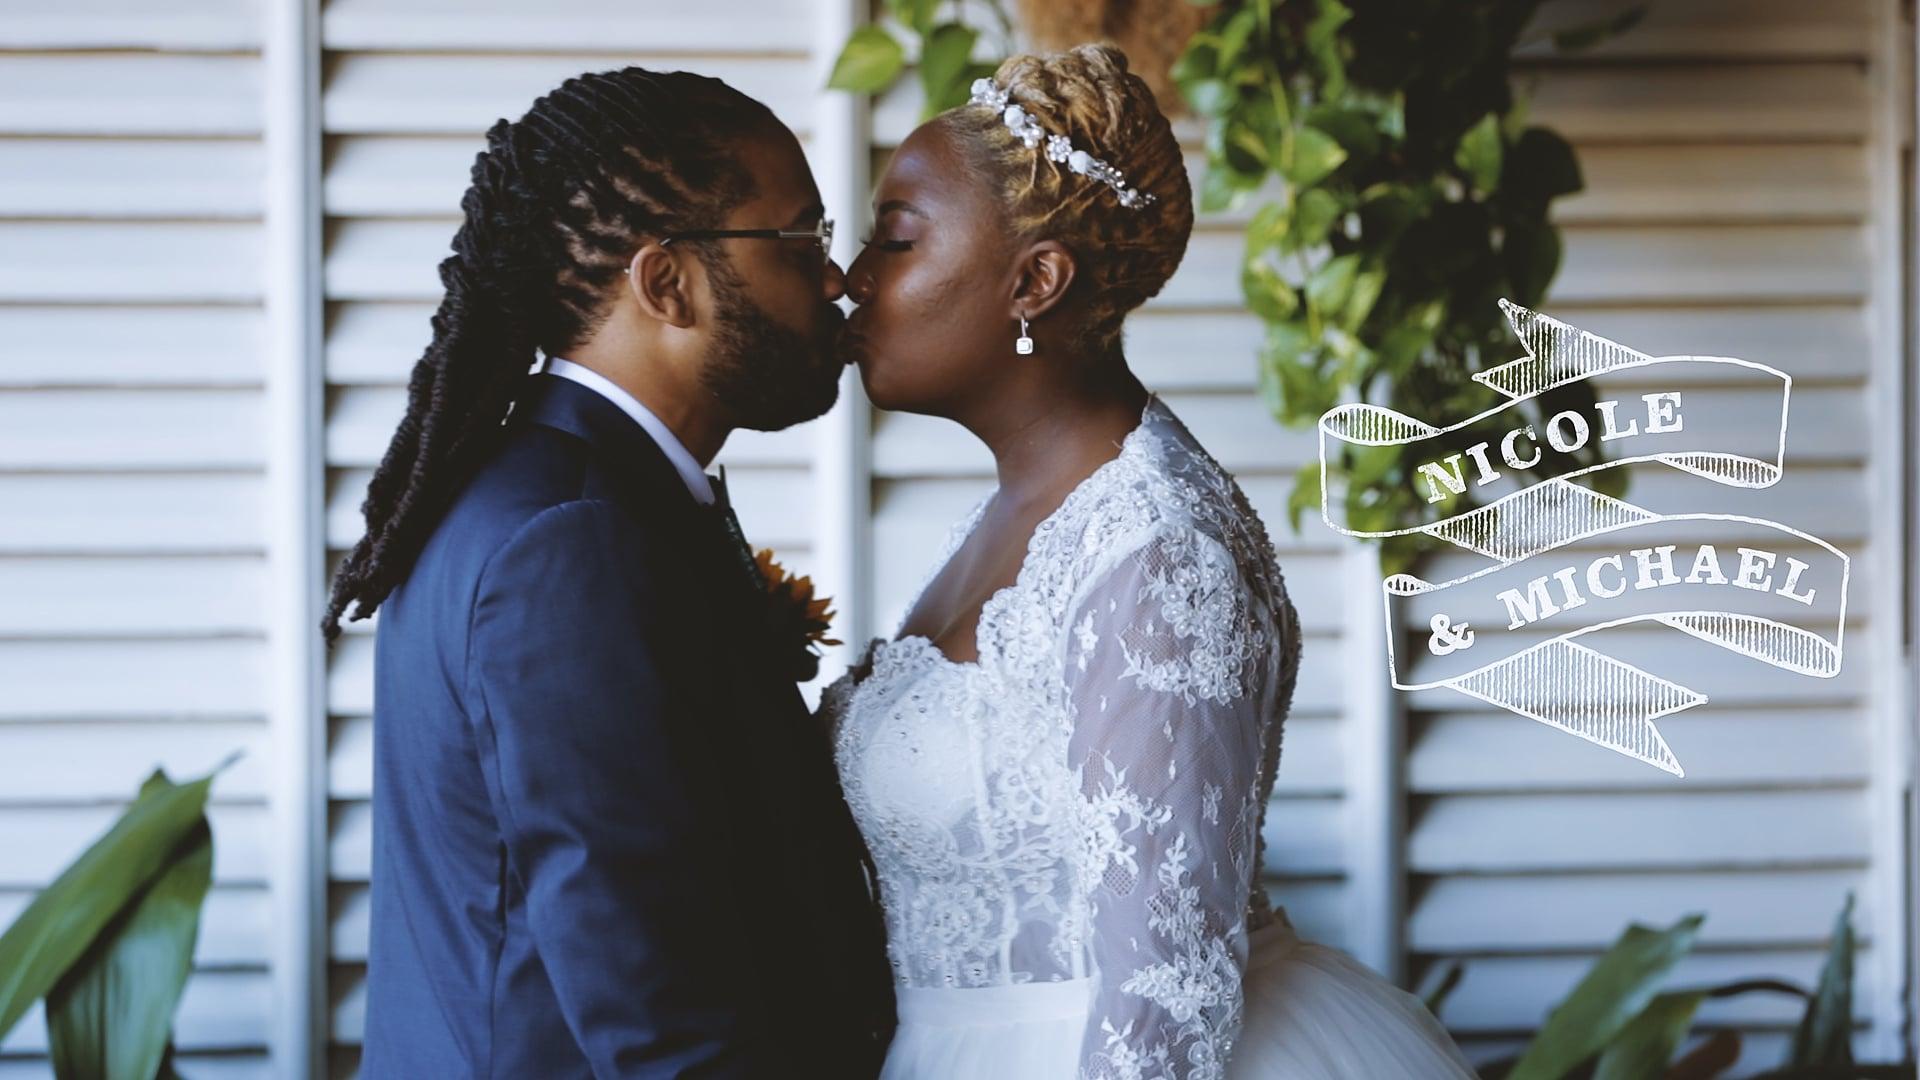 Nicole & Michael - A New Orleans Destination Wedding